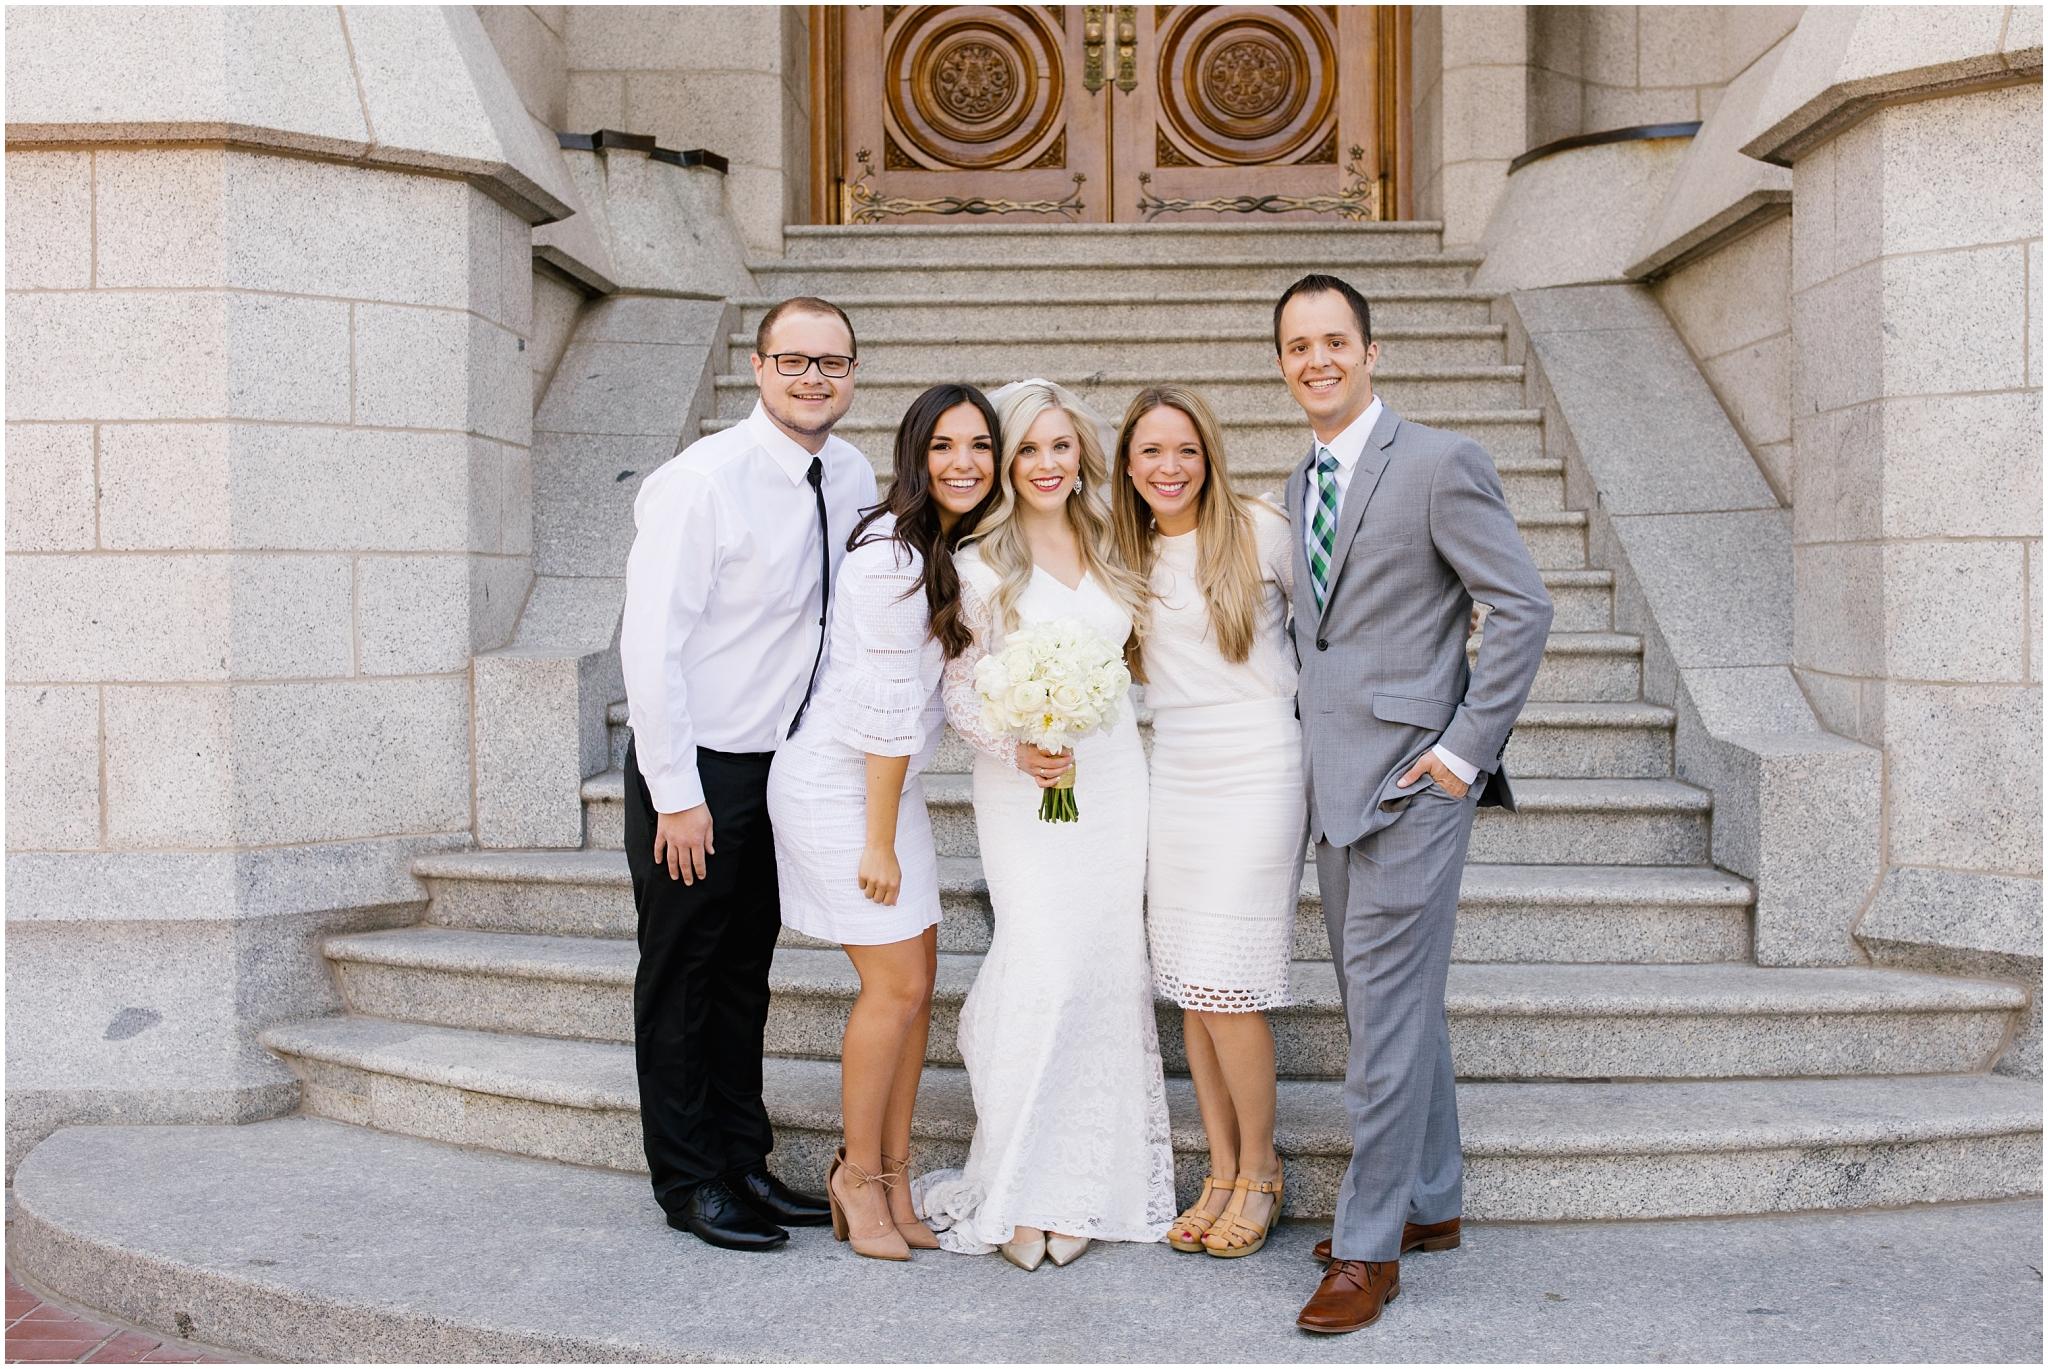 CherylandTyler-82_Lizzie-B-Imagery-Utah-Wedding-Photographer-Salt-Lake-City-Temple-Wells-Fargo-Building-Reception.jpg